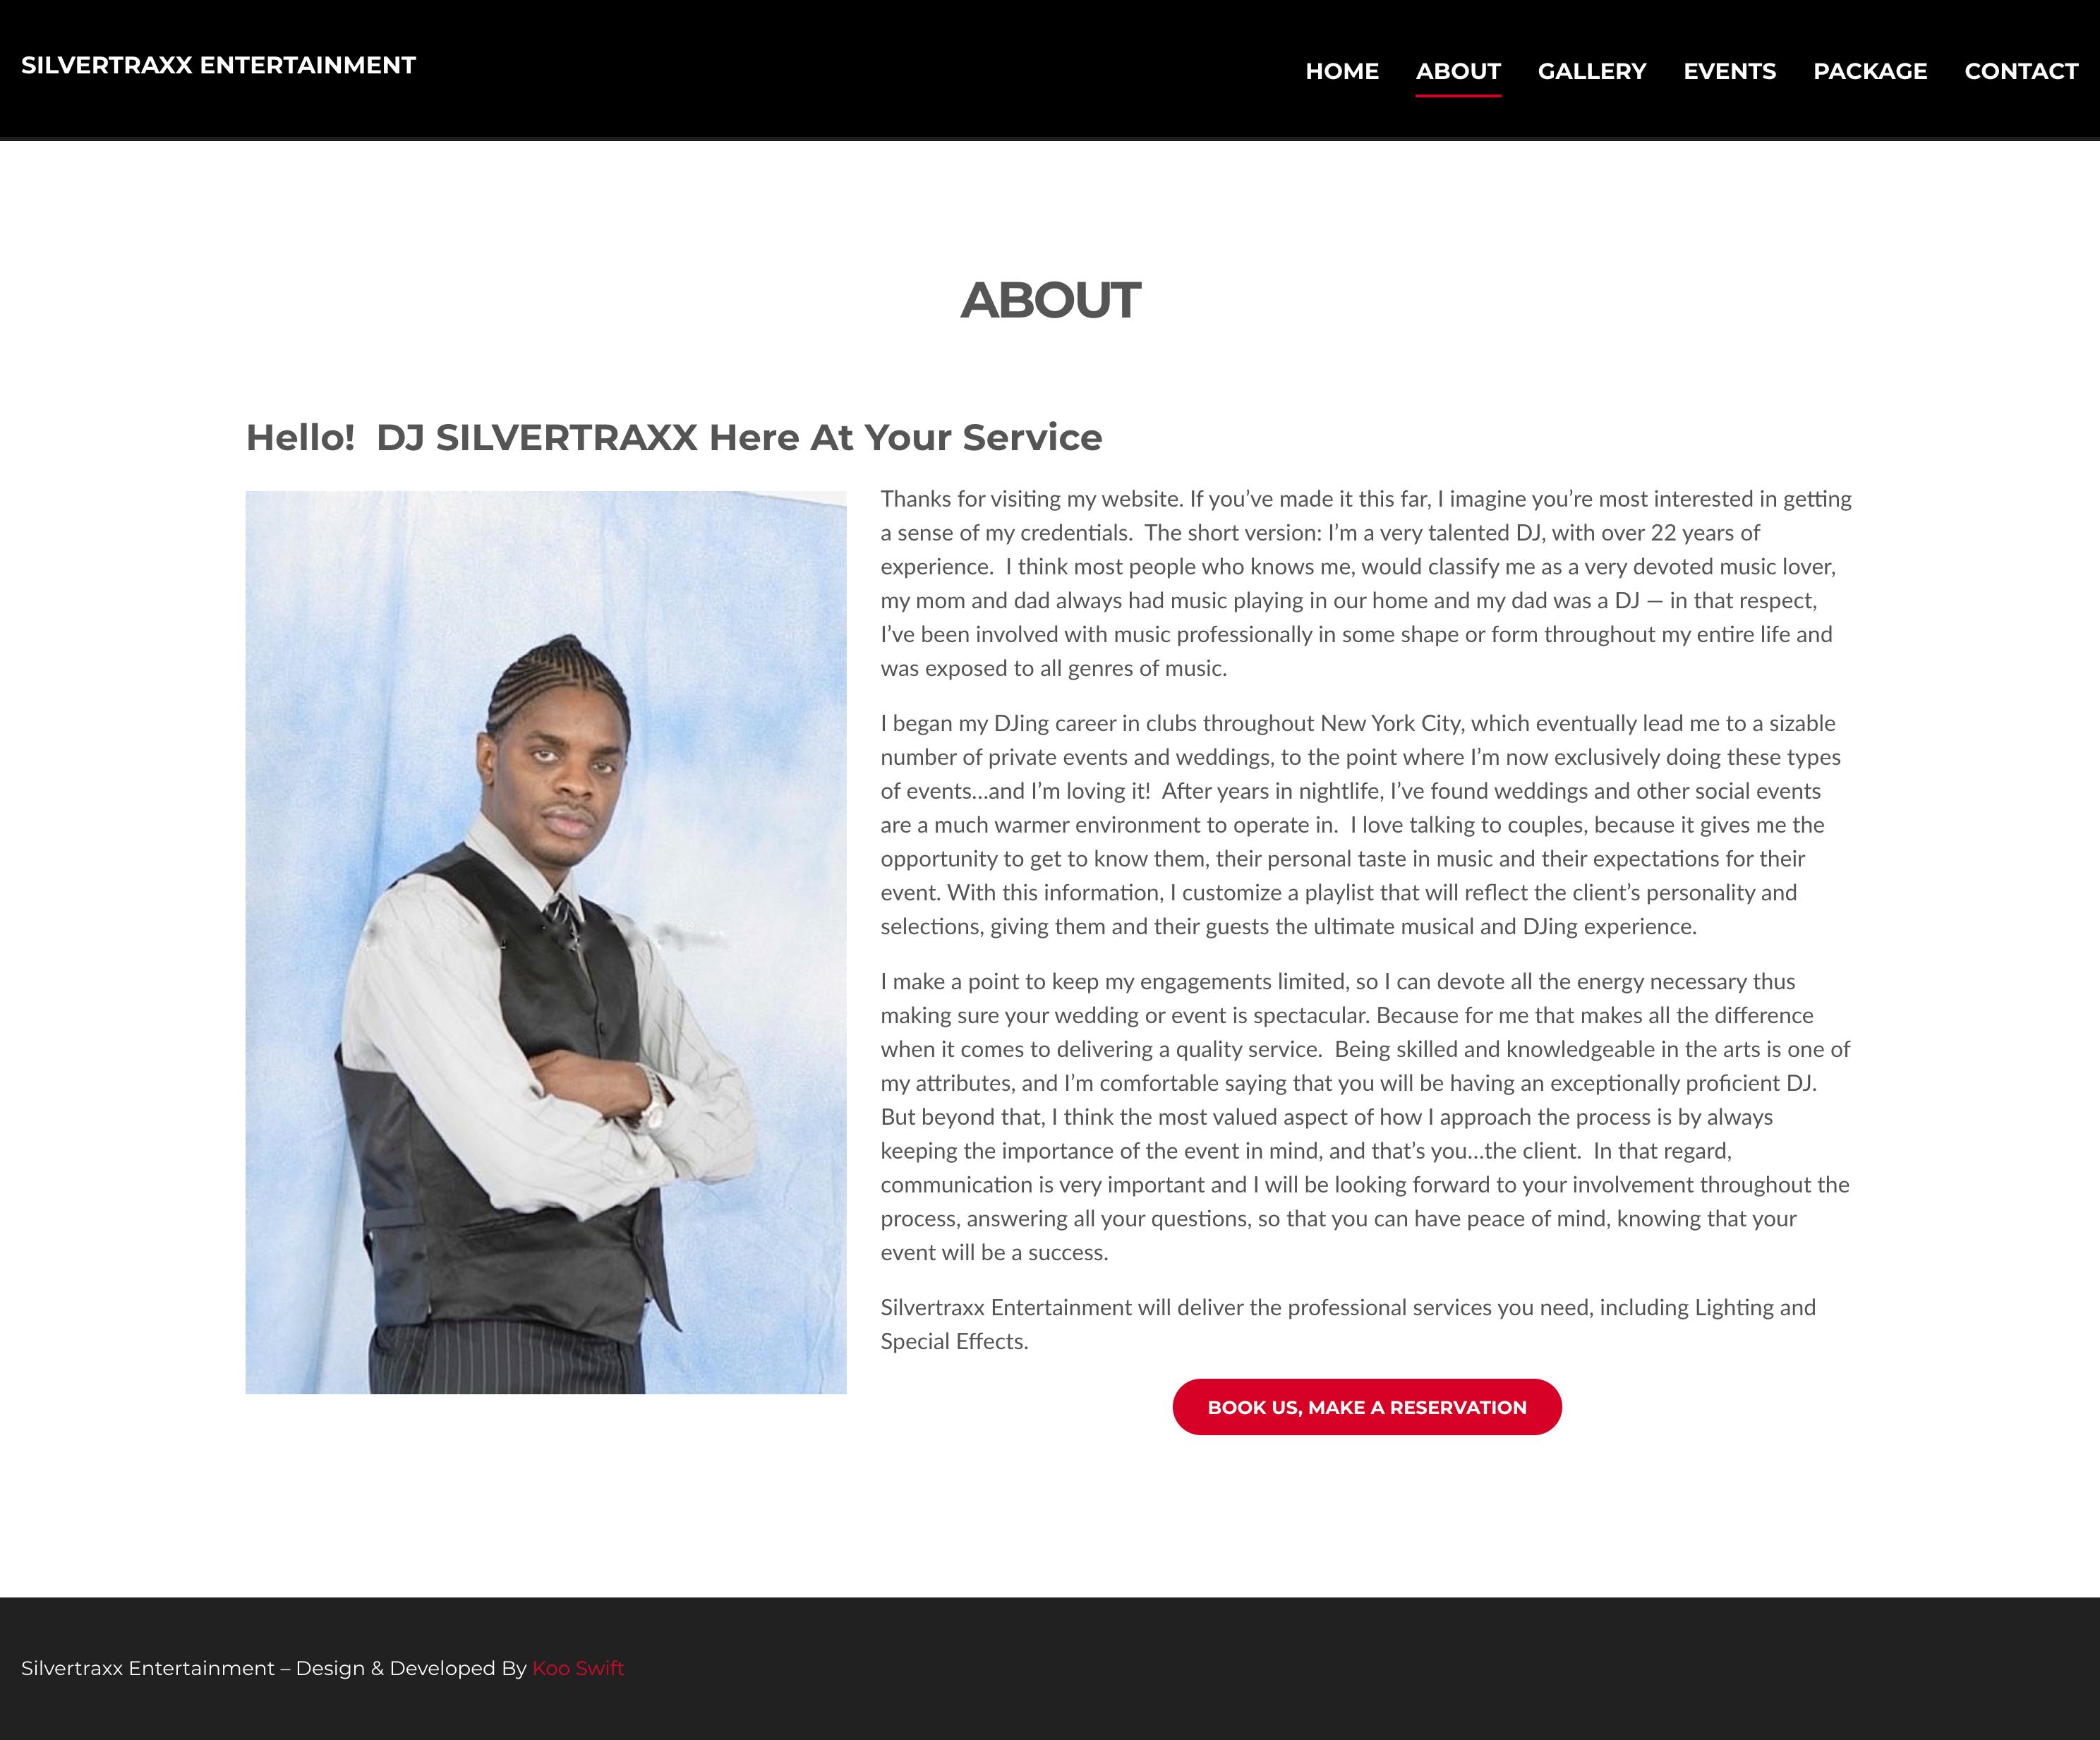 Silvertraxx Entertainment about